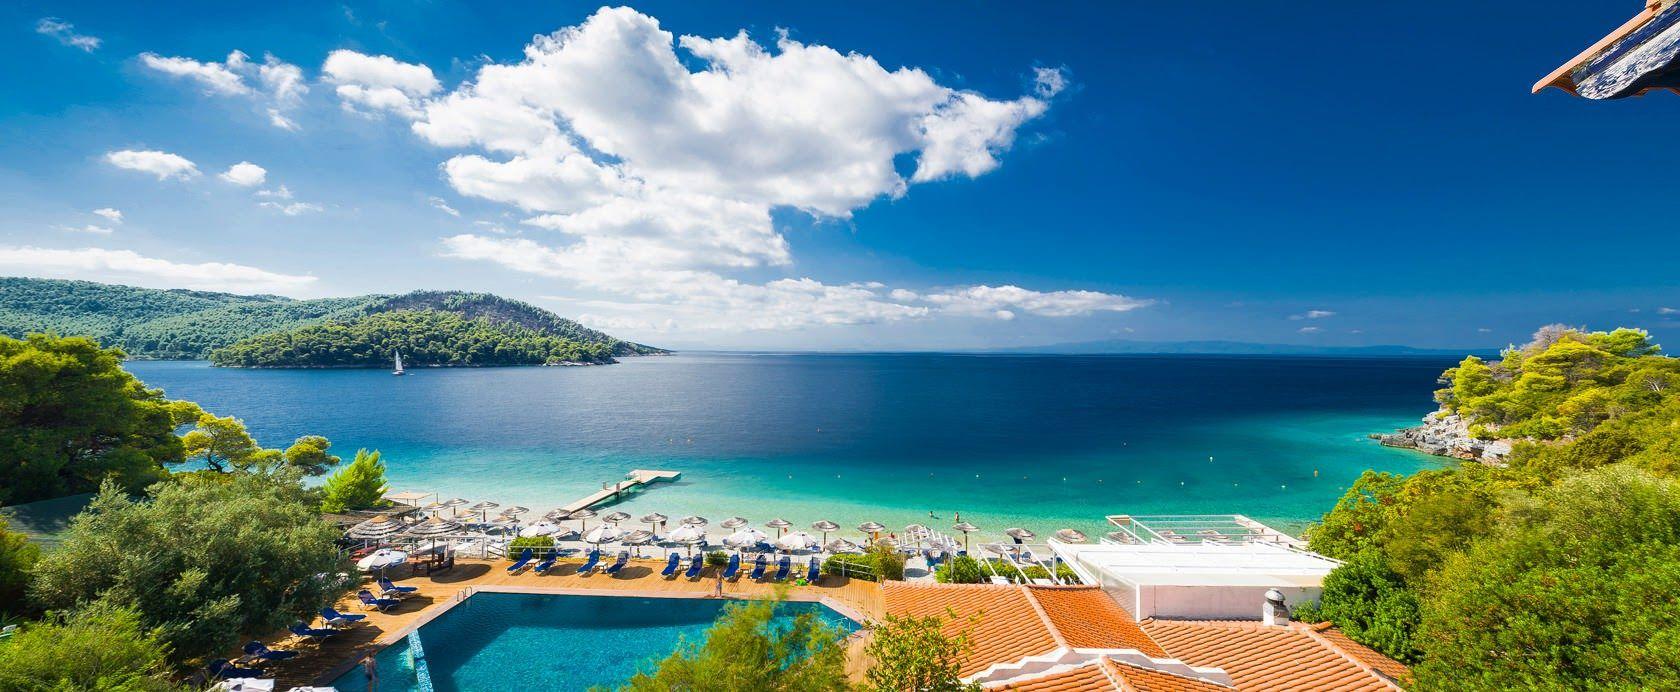 Adrina Beach - Skopelos